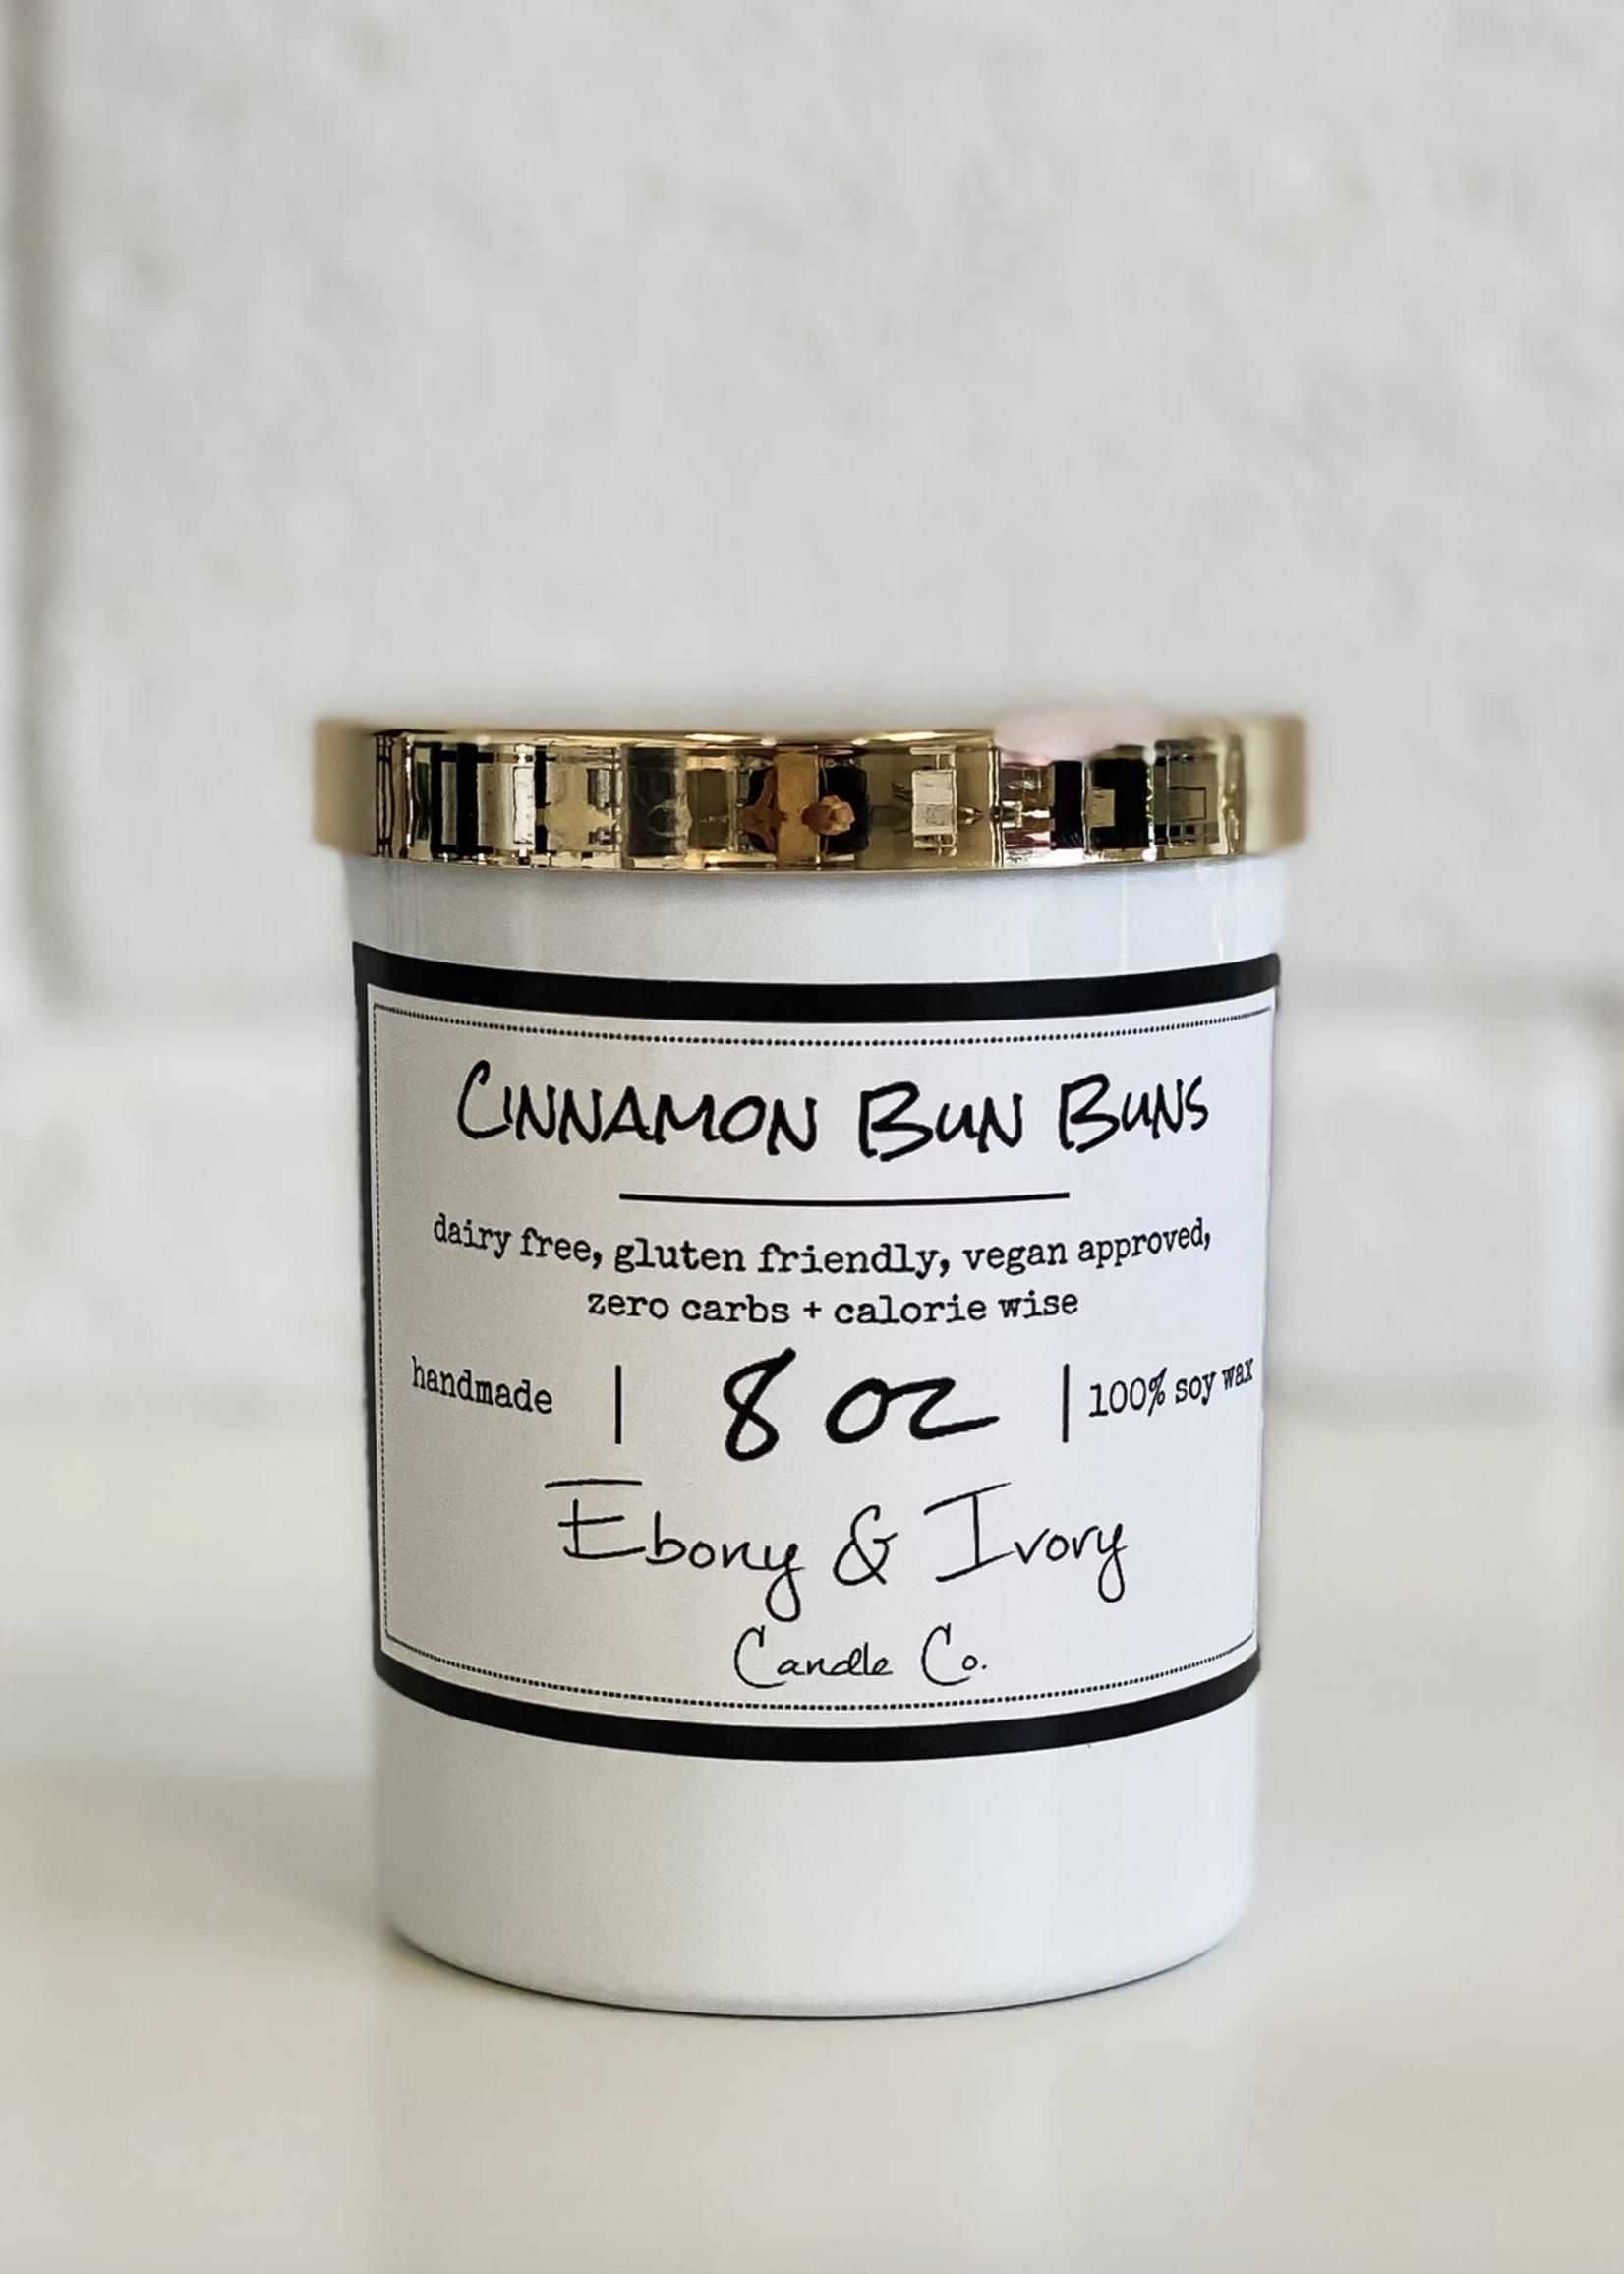 Ebony & Ivory Candle Co. Cinnamon Bun Buns- 8oz